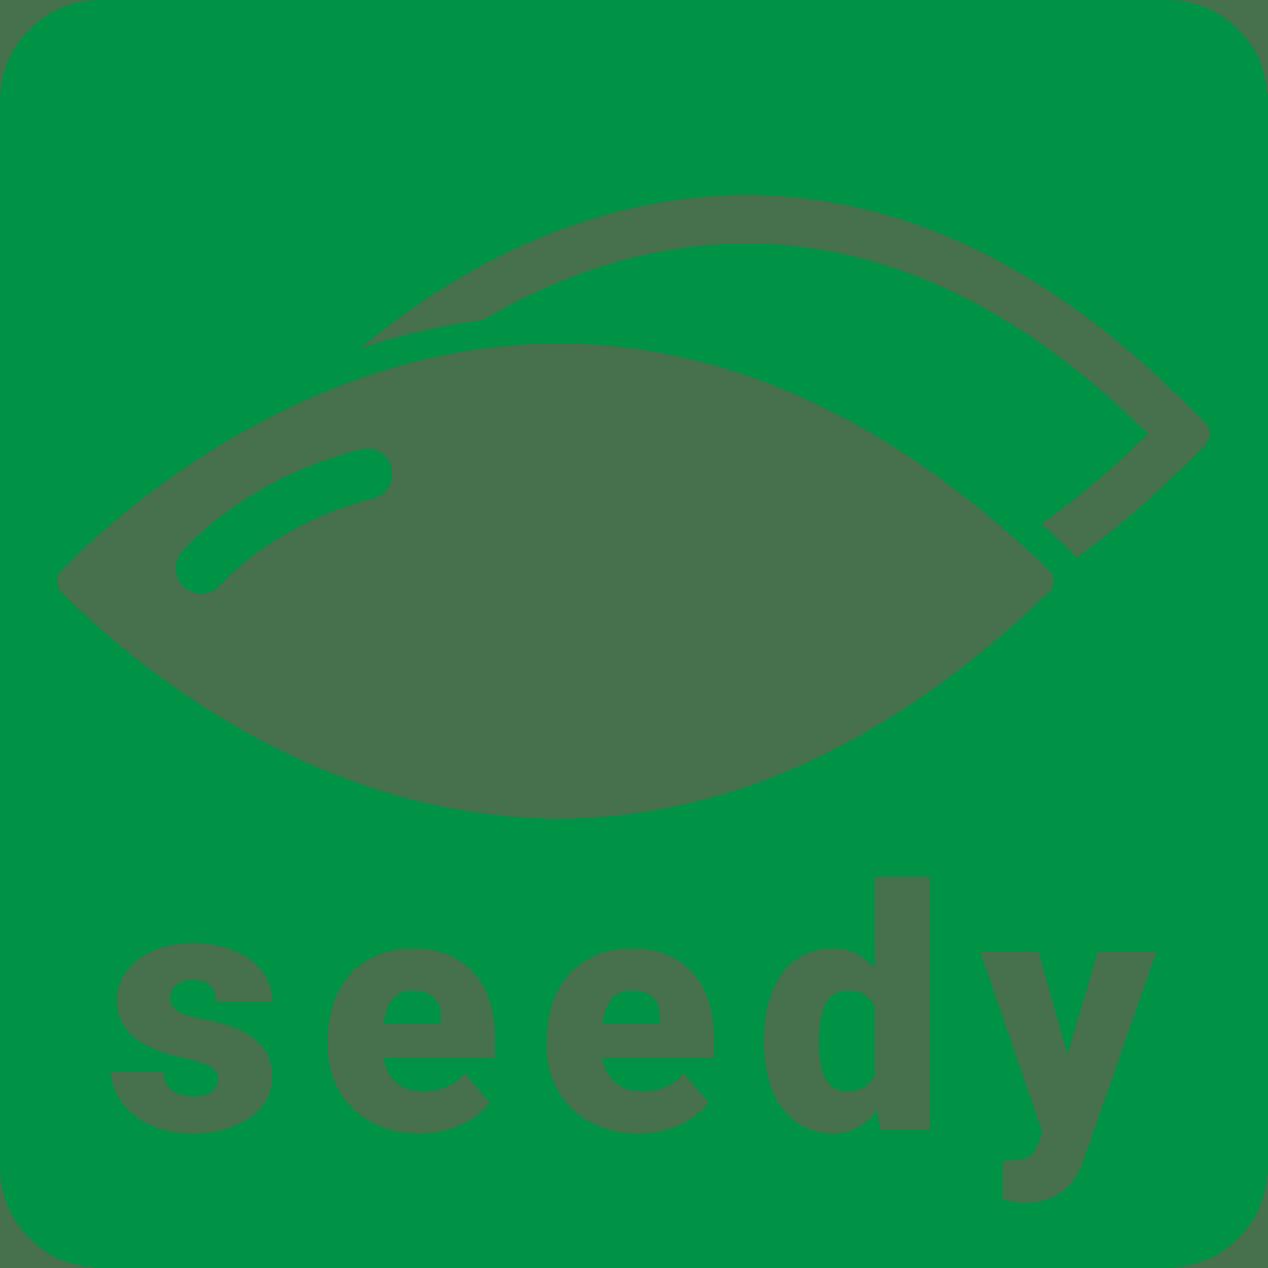 Seedy icon